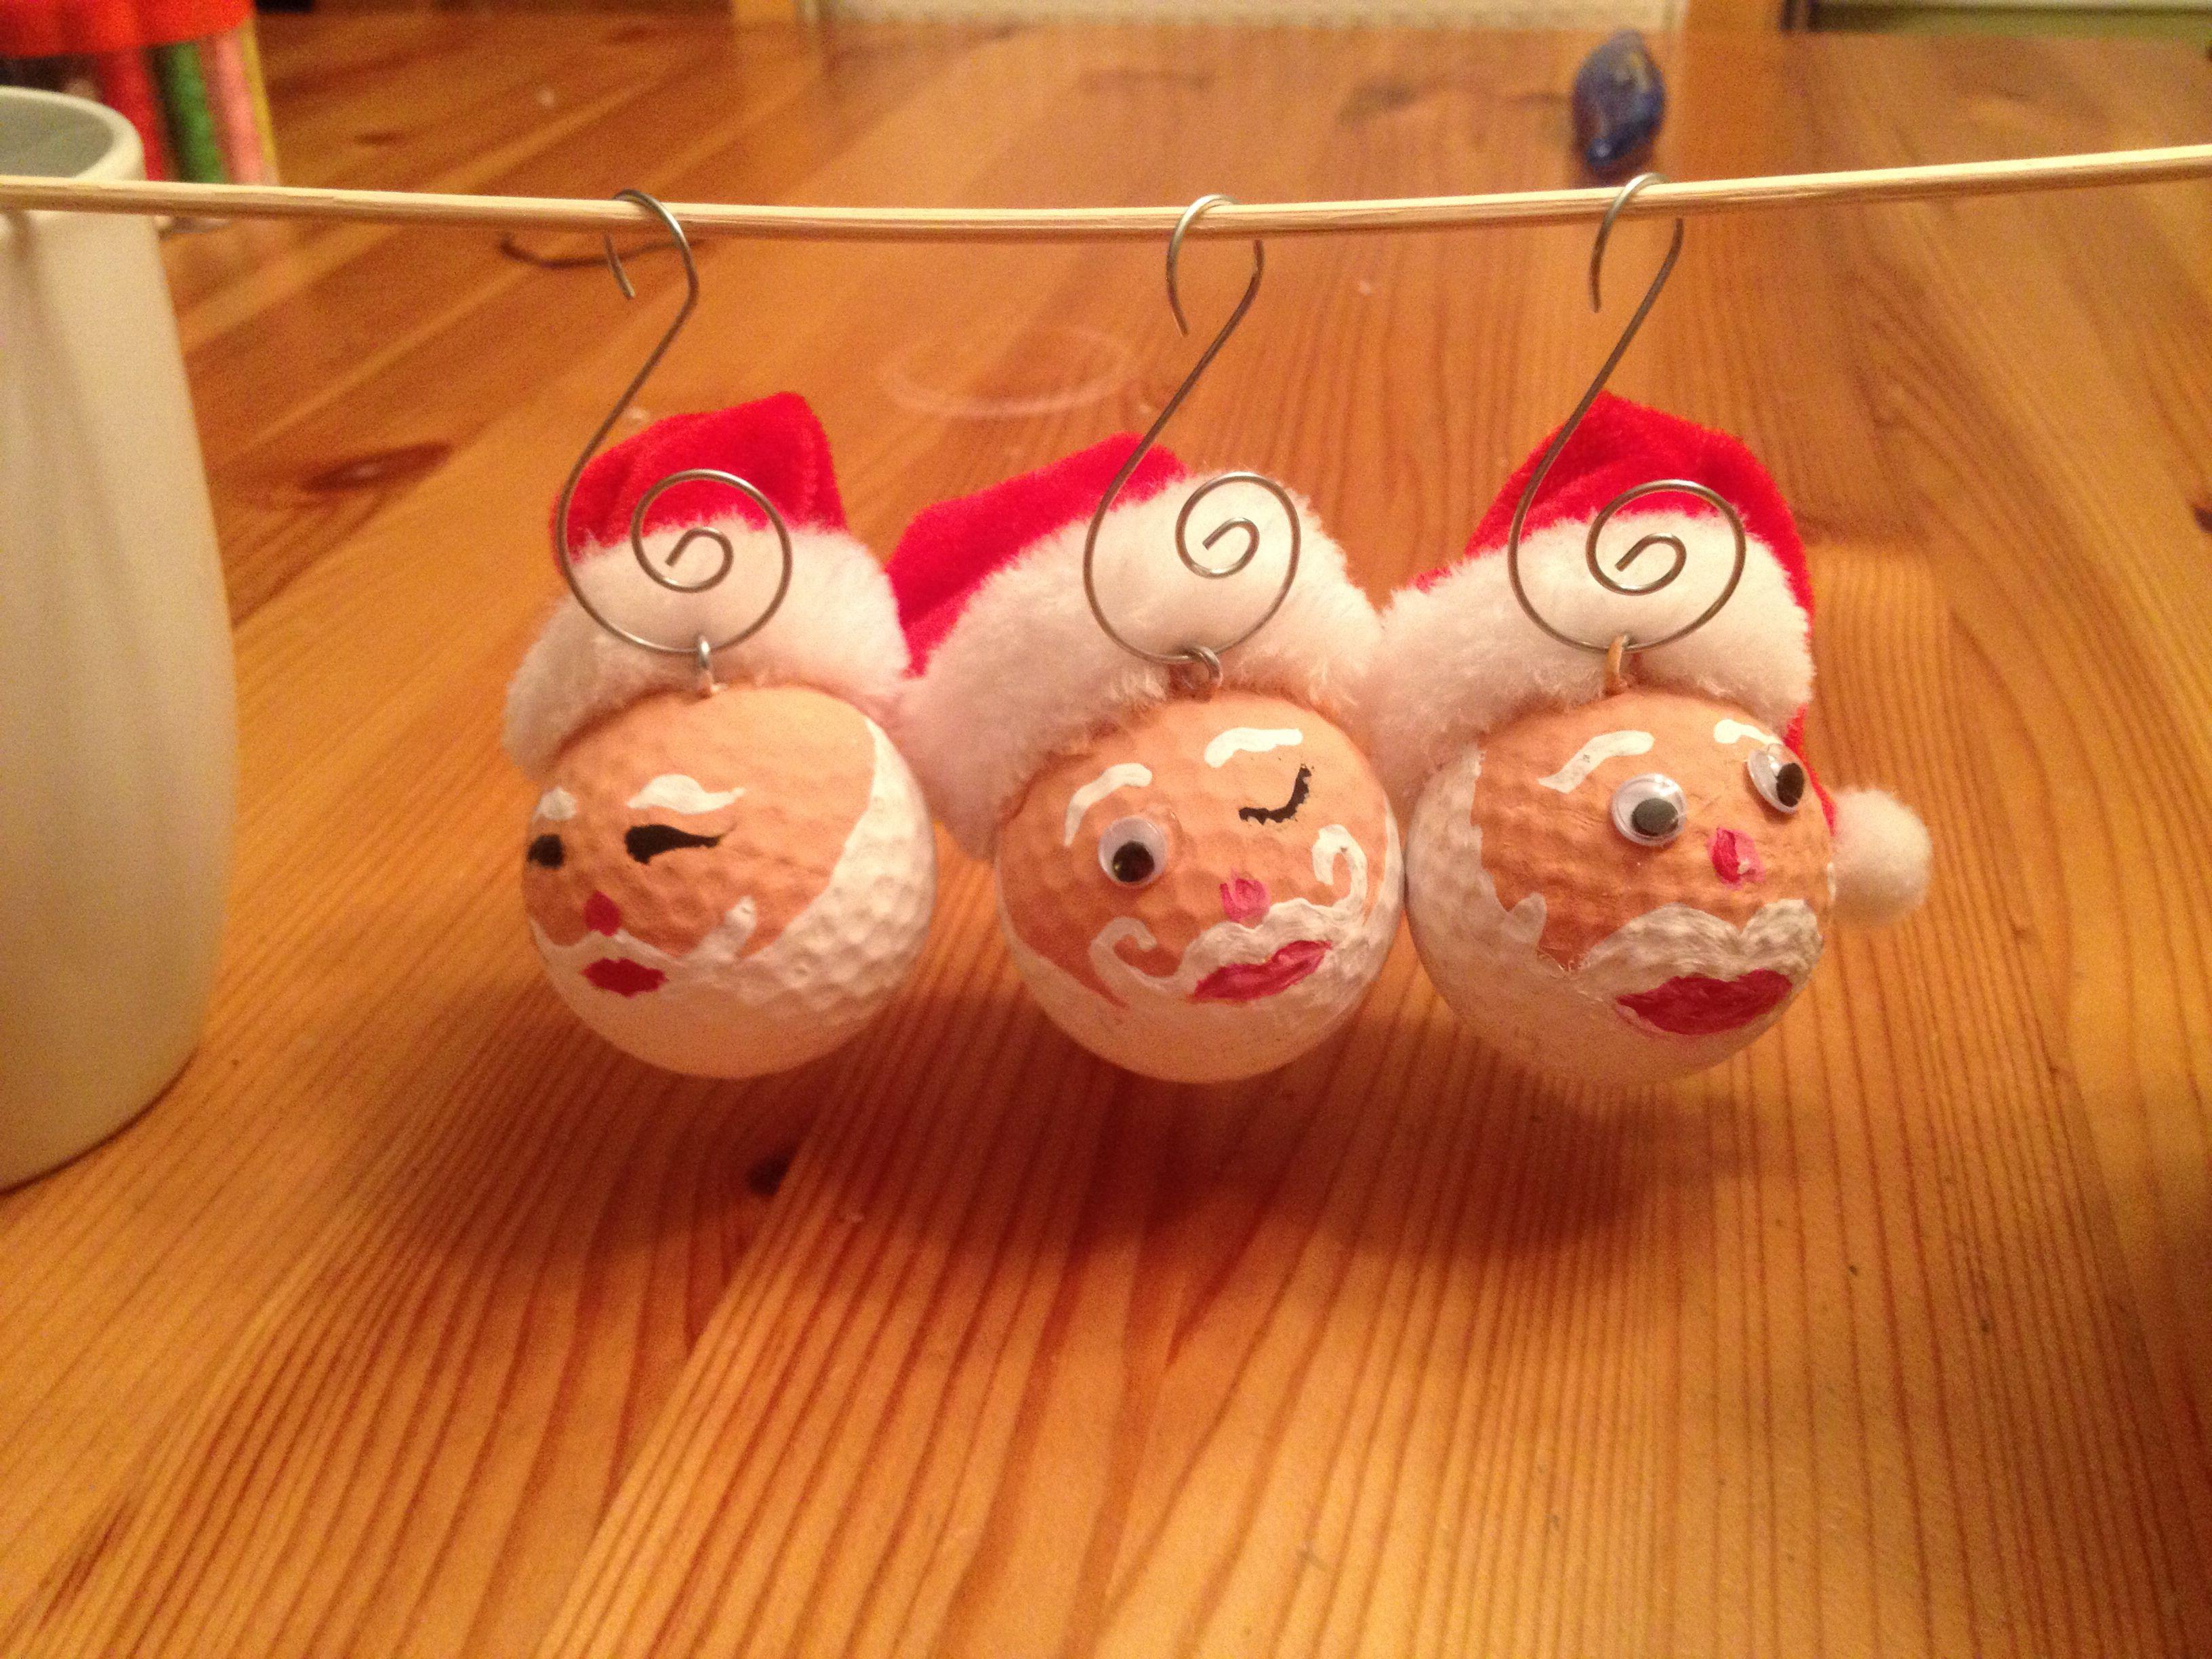 Weihnachtsmann-Deko aus alten Golfbällen #kgc #golfball ...